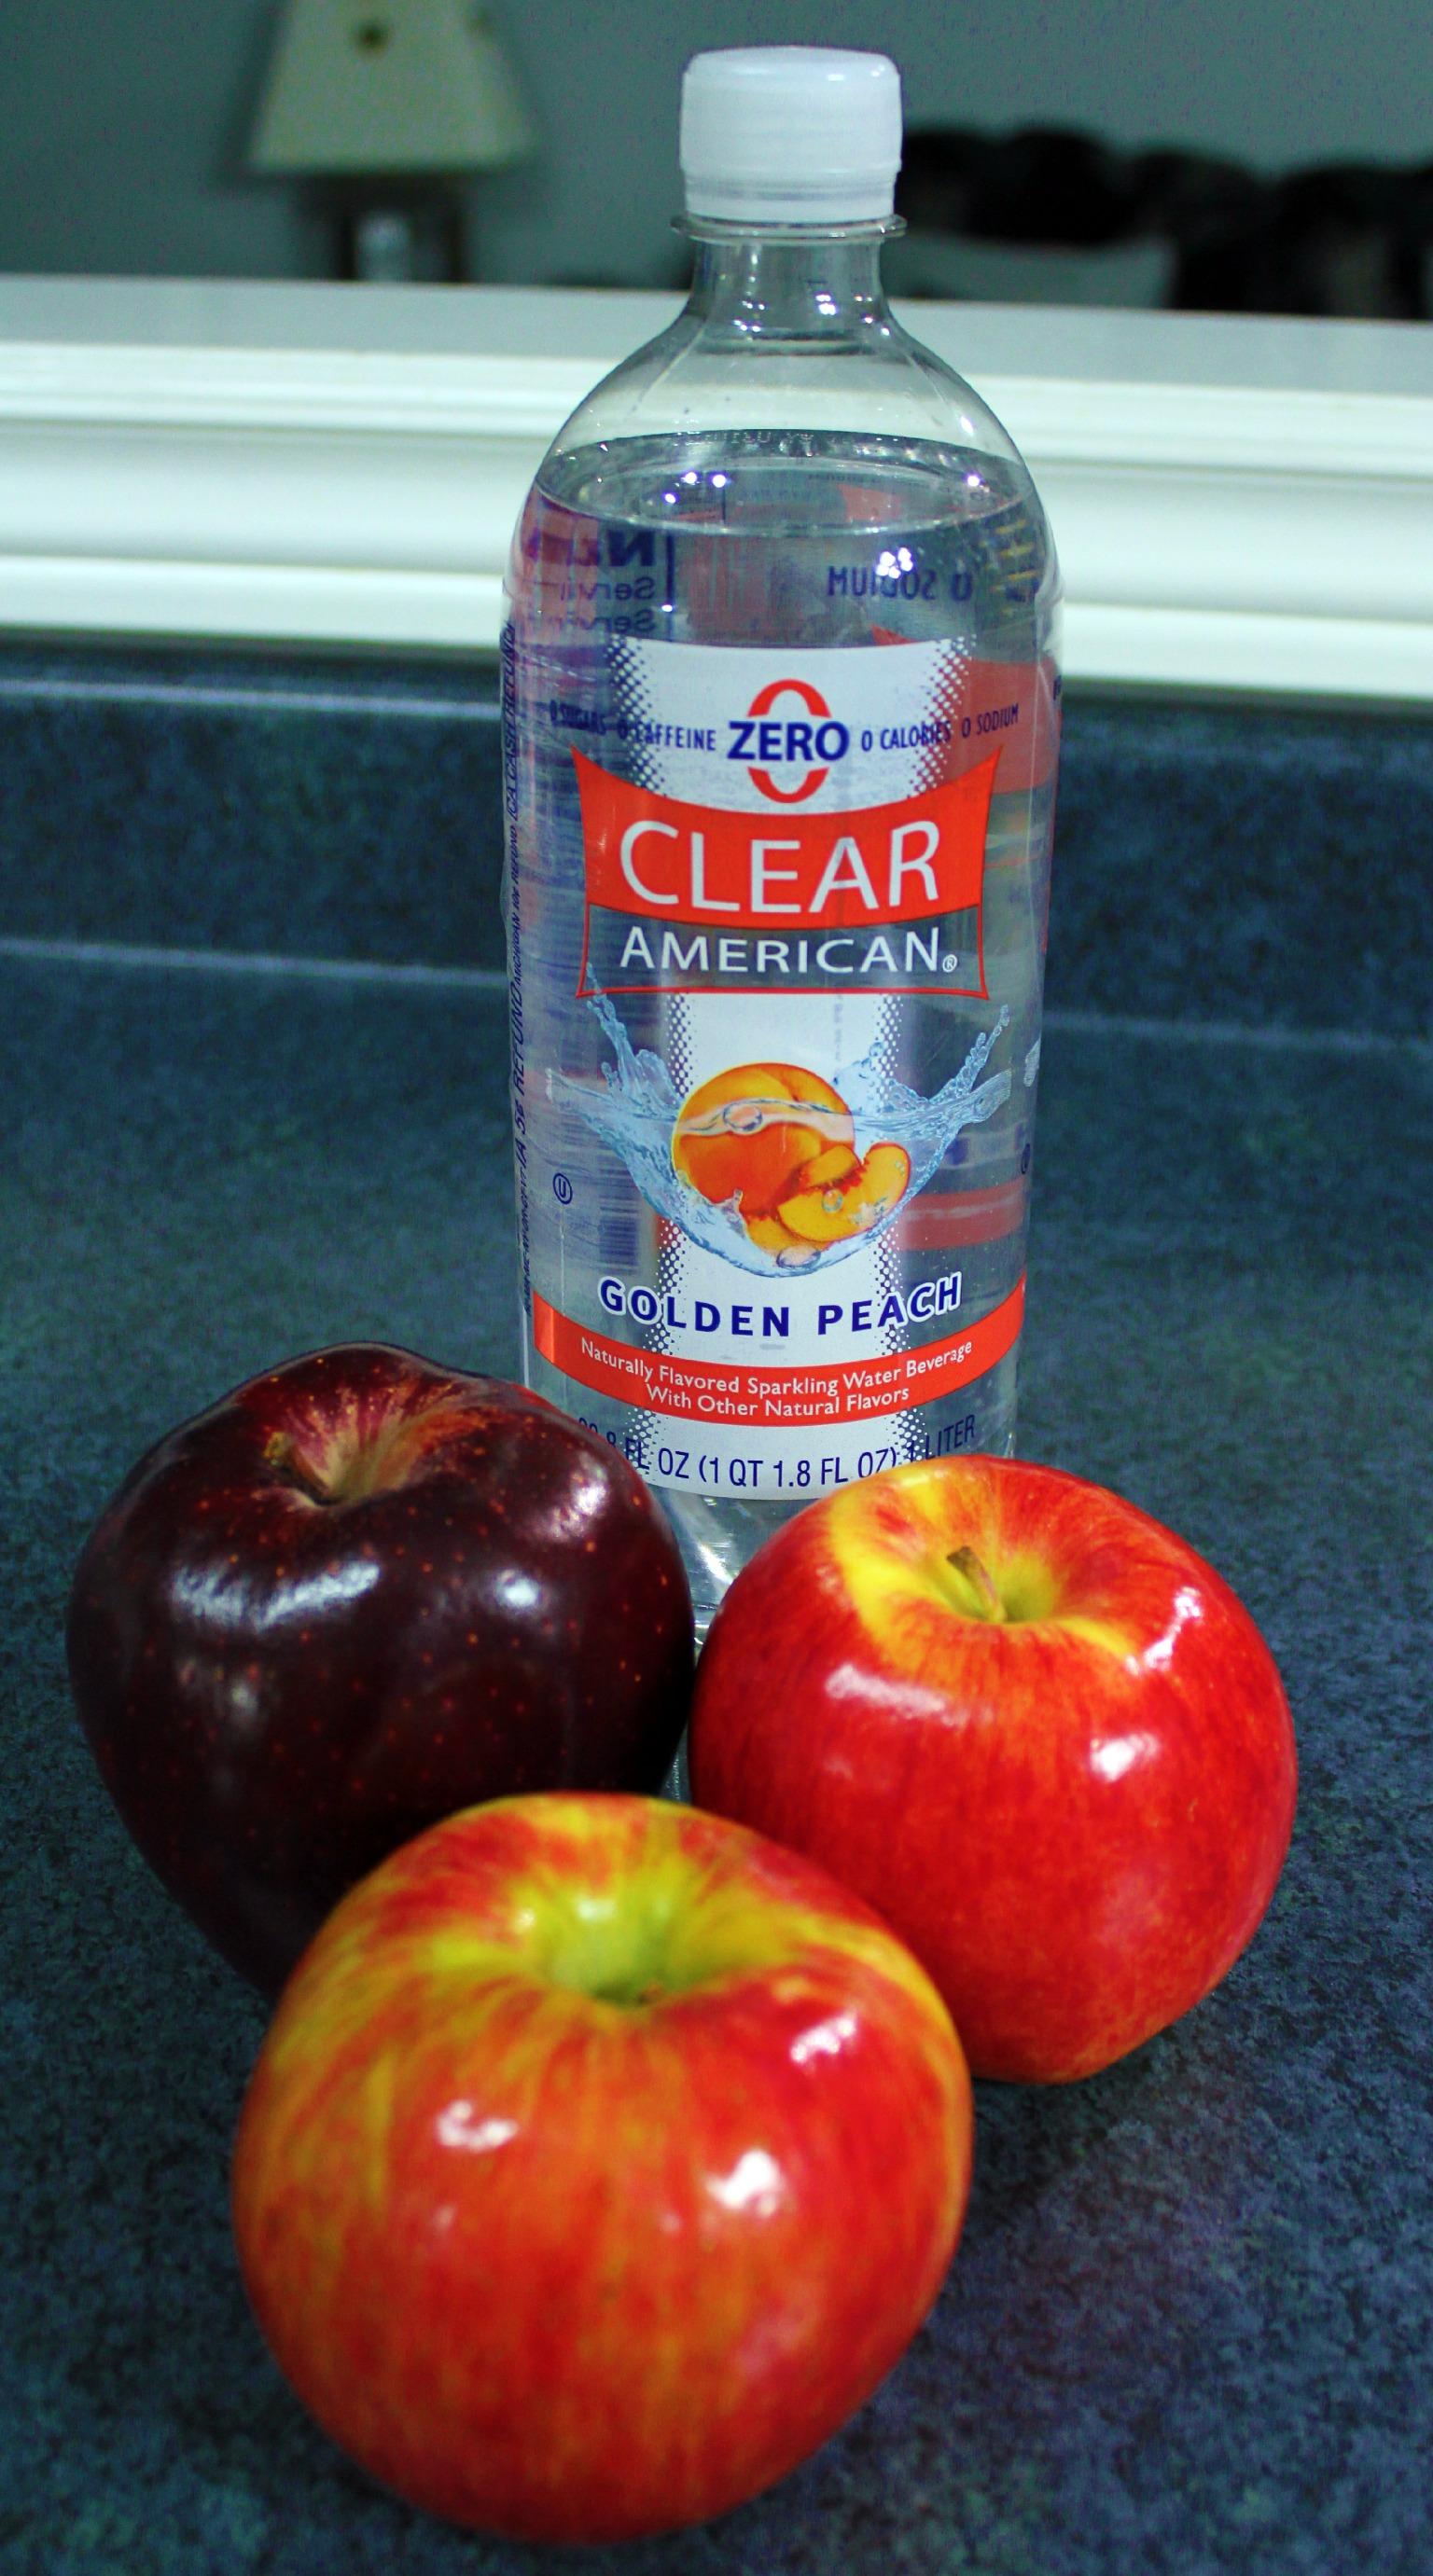 #ClearAmerican Apple-Peach Caramel Explosion Cupcakes!